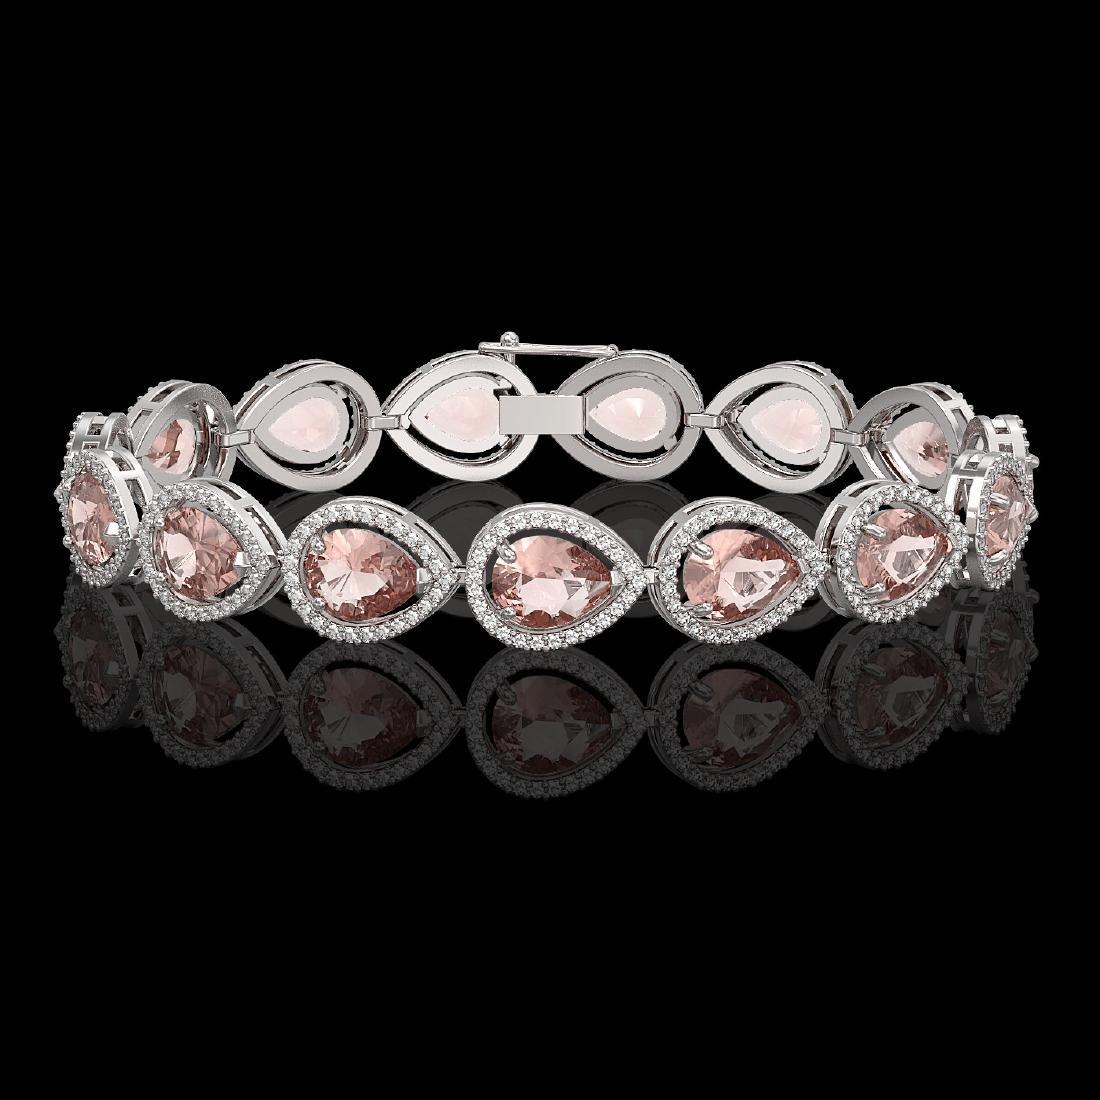 19.55 CTW Morganite & Diamond Halo Bracelet 10K White